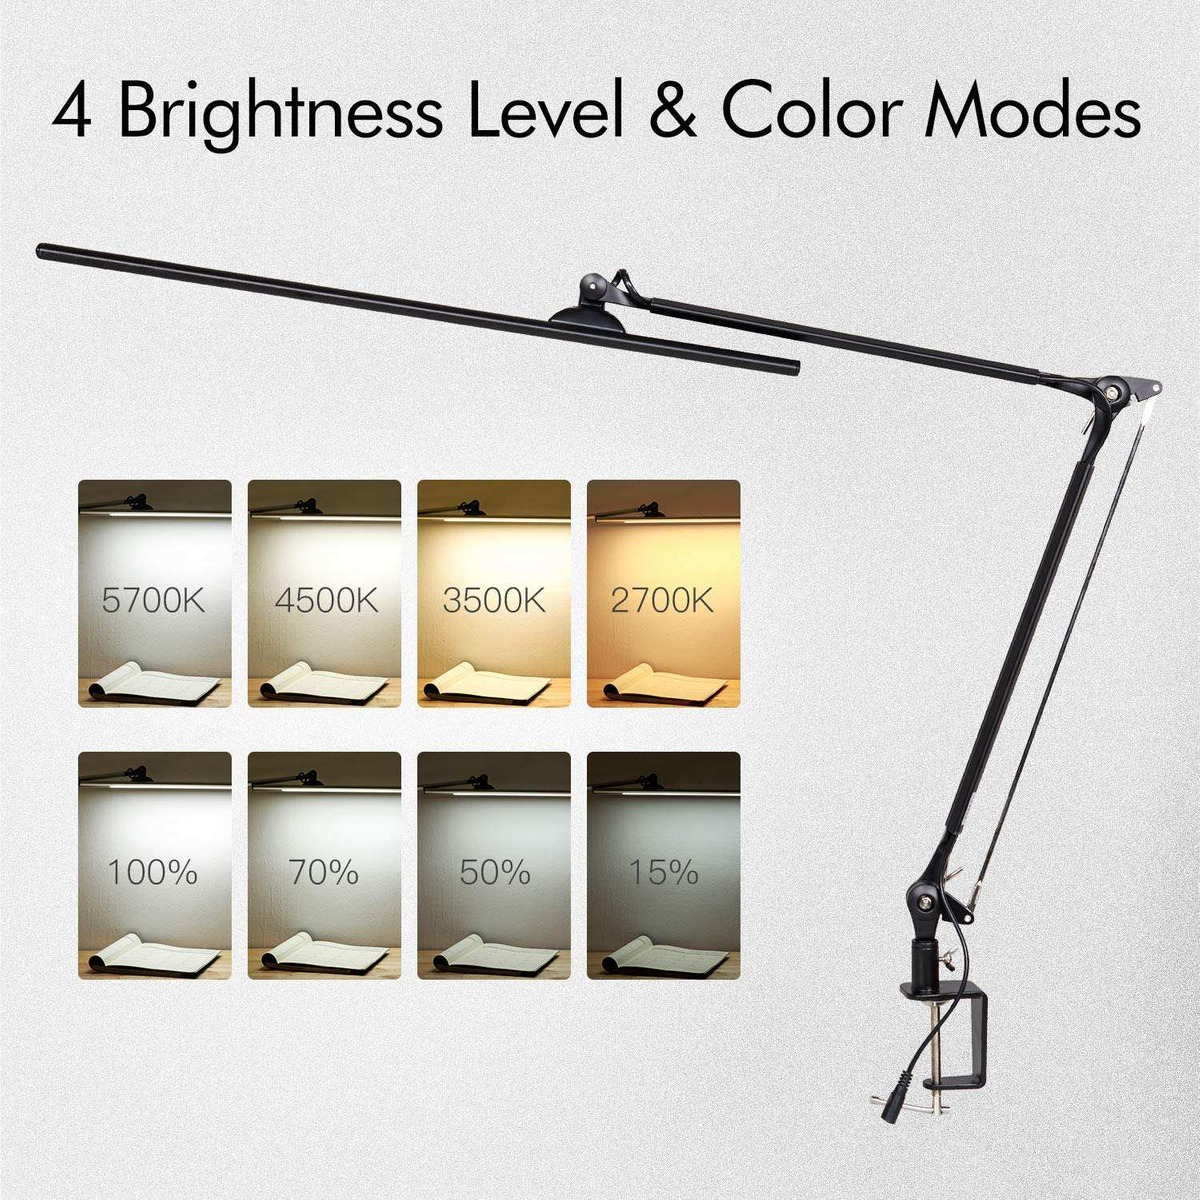 Amico 11w Led Architect Desk Lamp Clamp Lamp Metal Swing Arm 380 900 En Mercado Libre